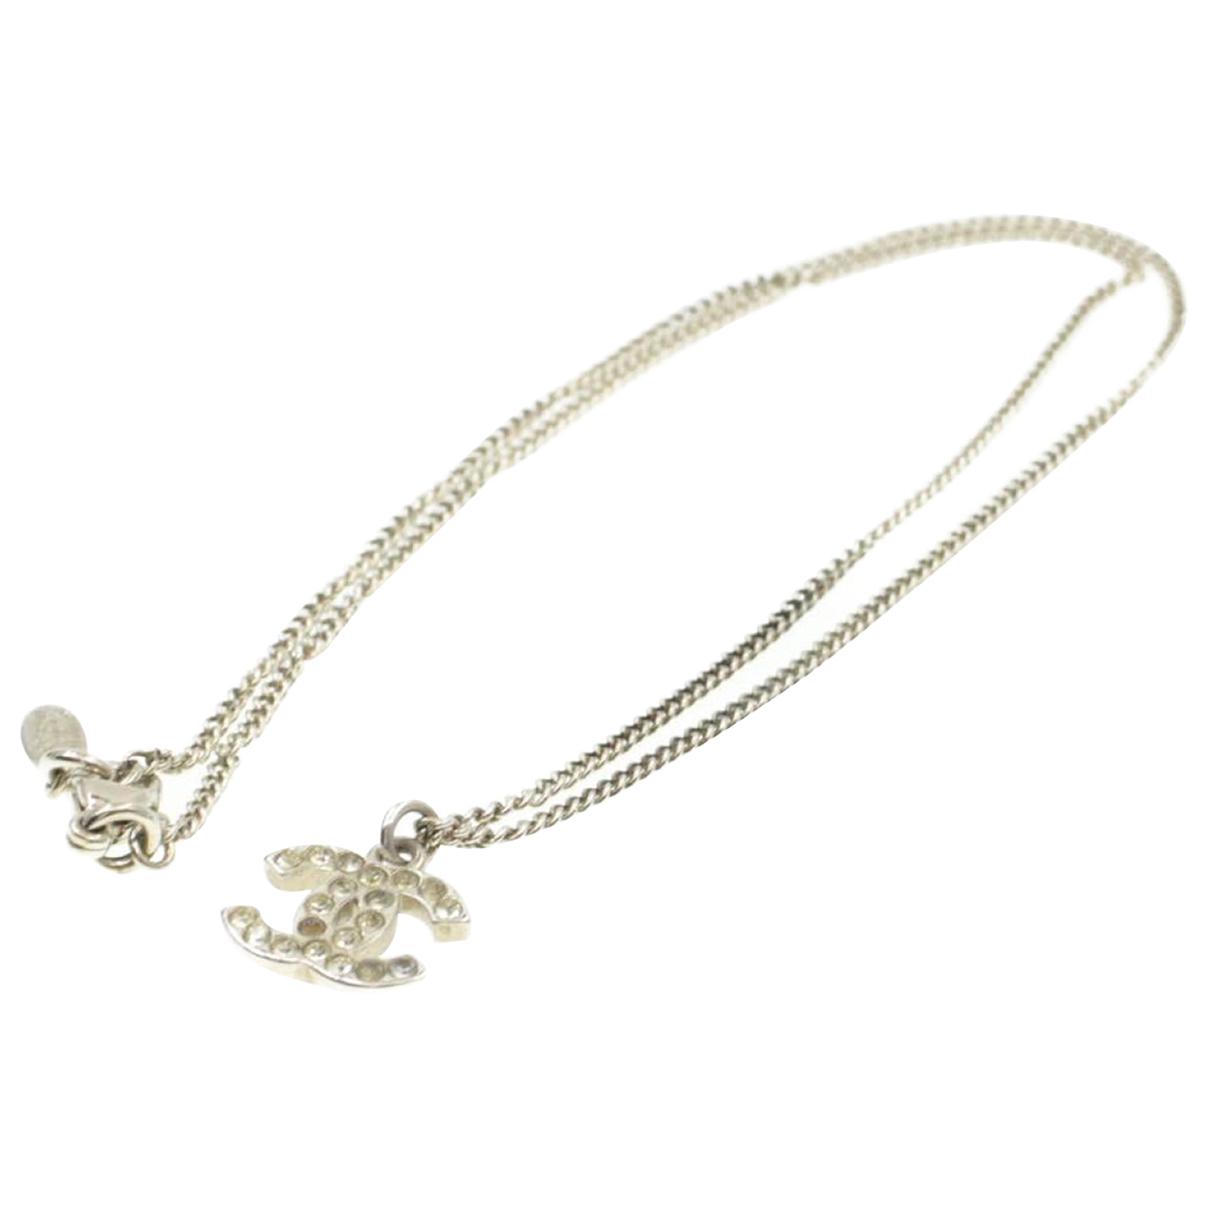 Chanel \N Kette in  Silber Metall